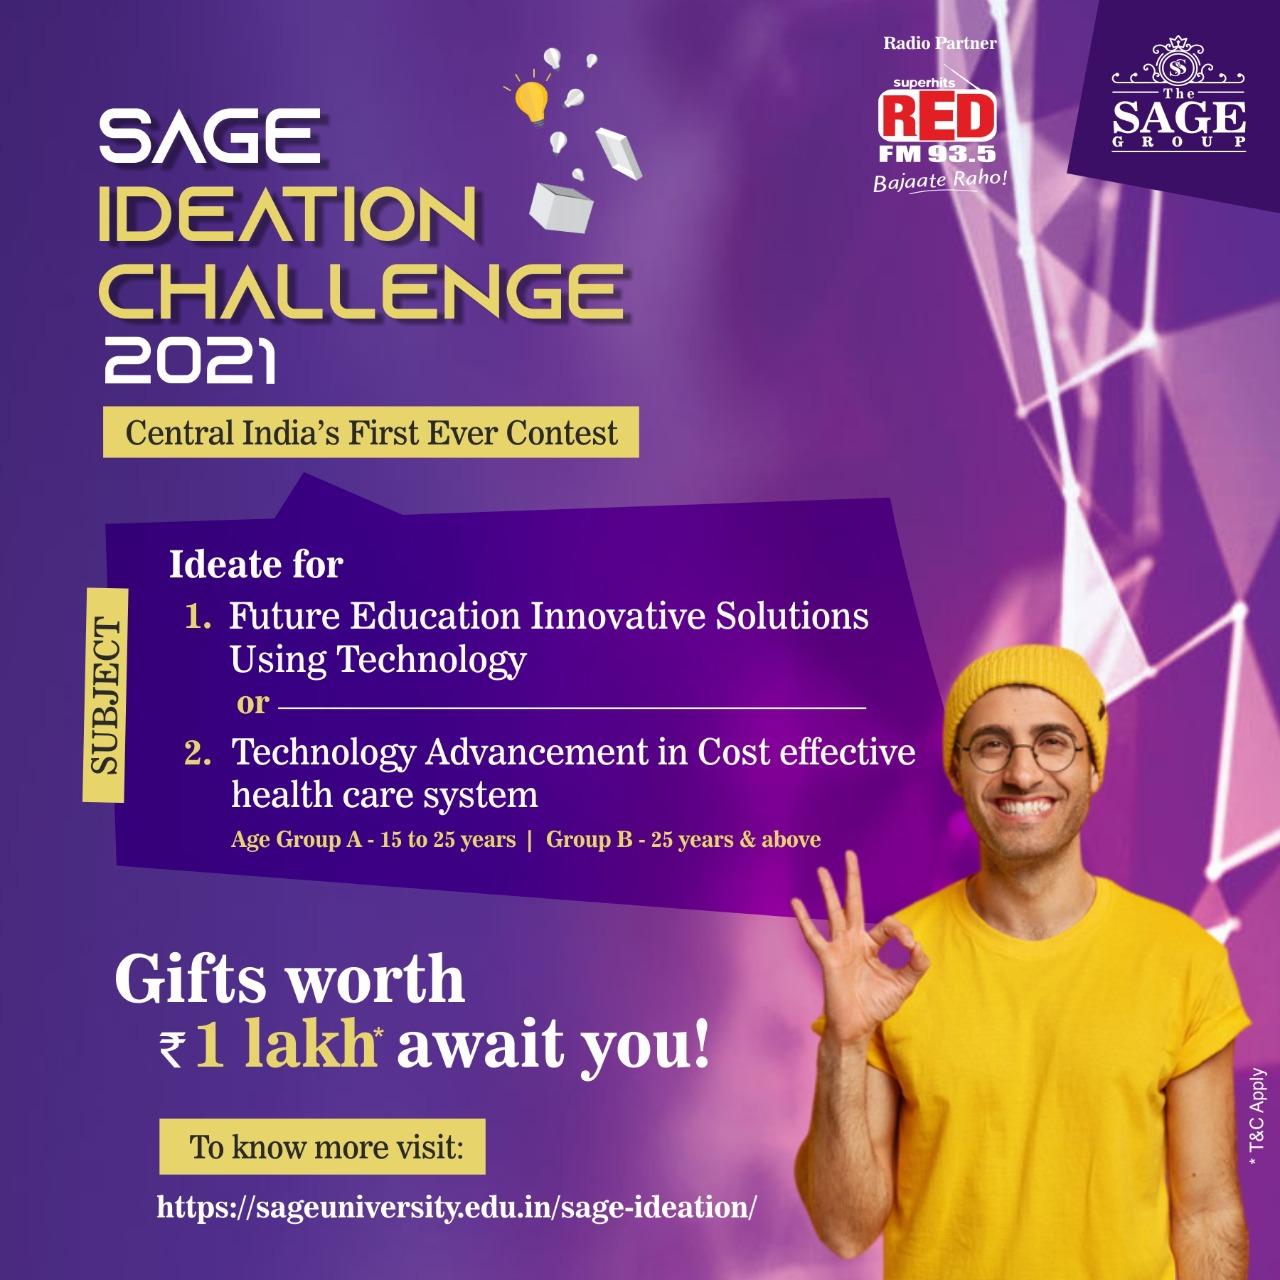 SAGE University